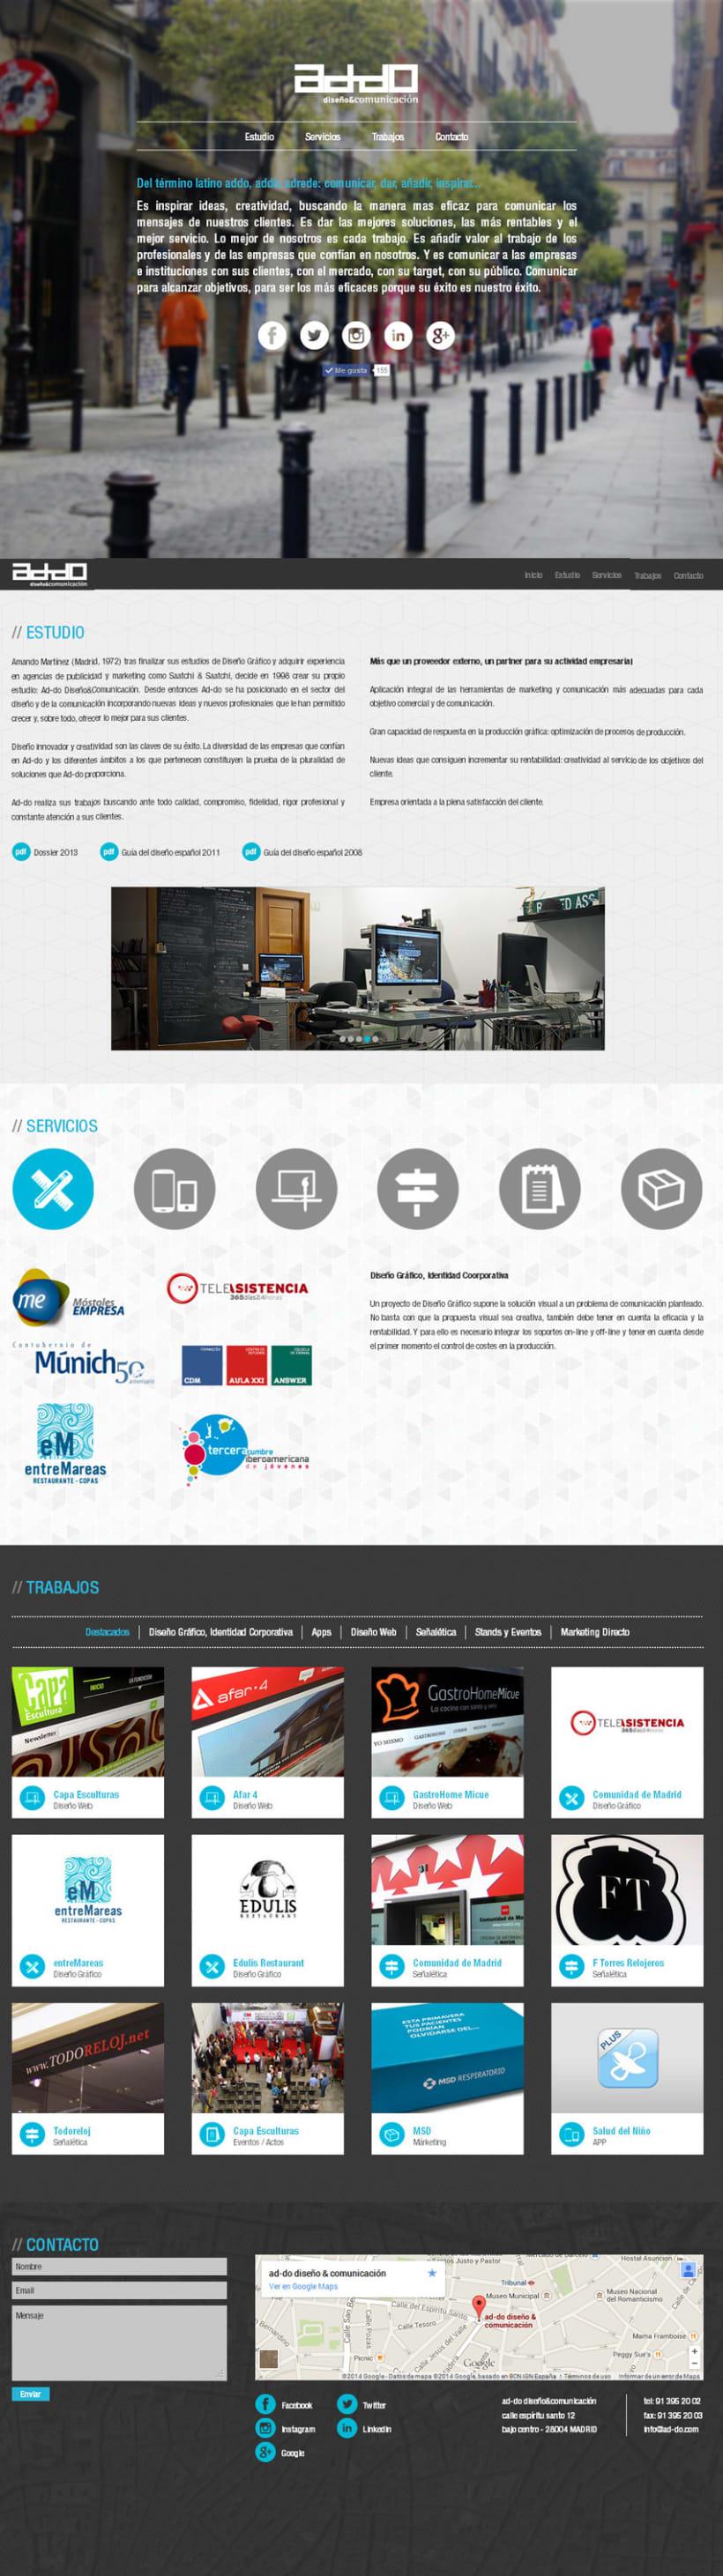 CSS - Responsive Design - Addo 0